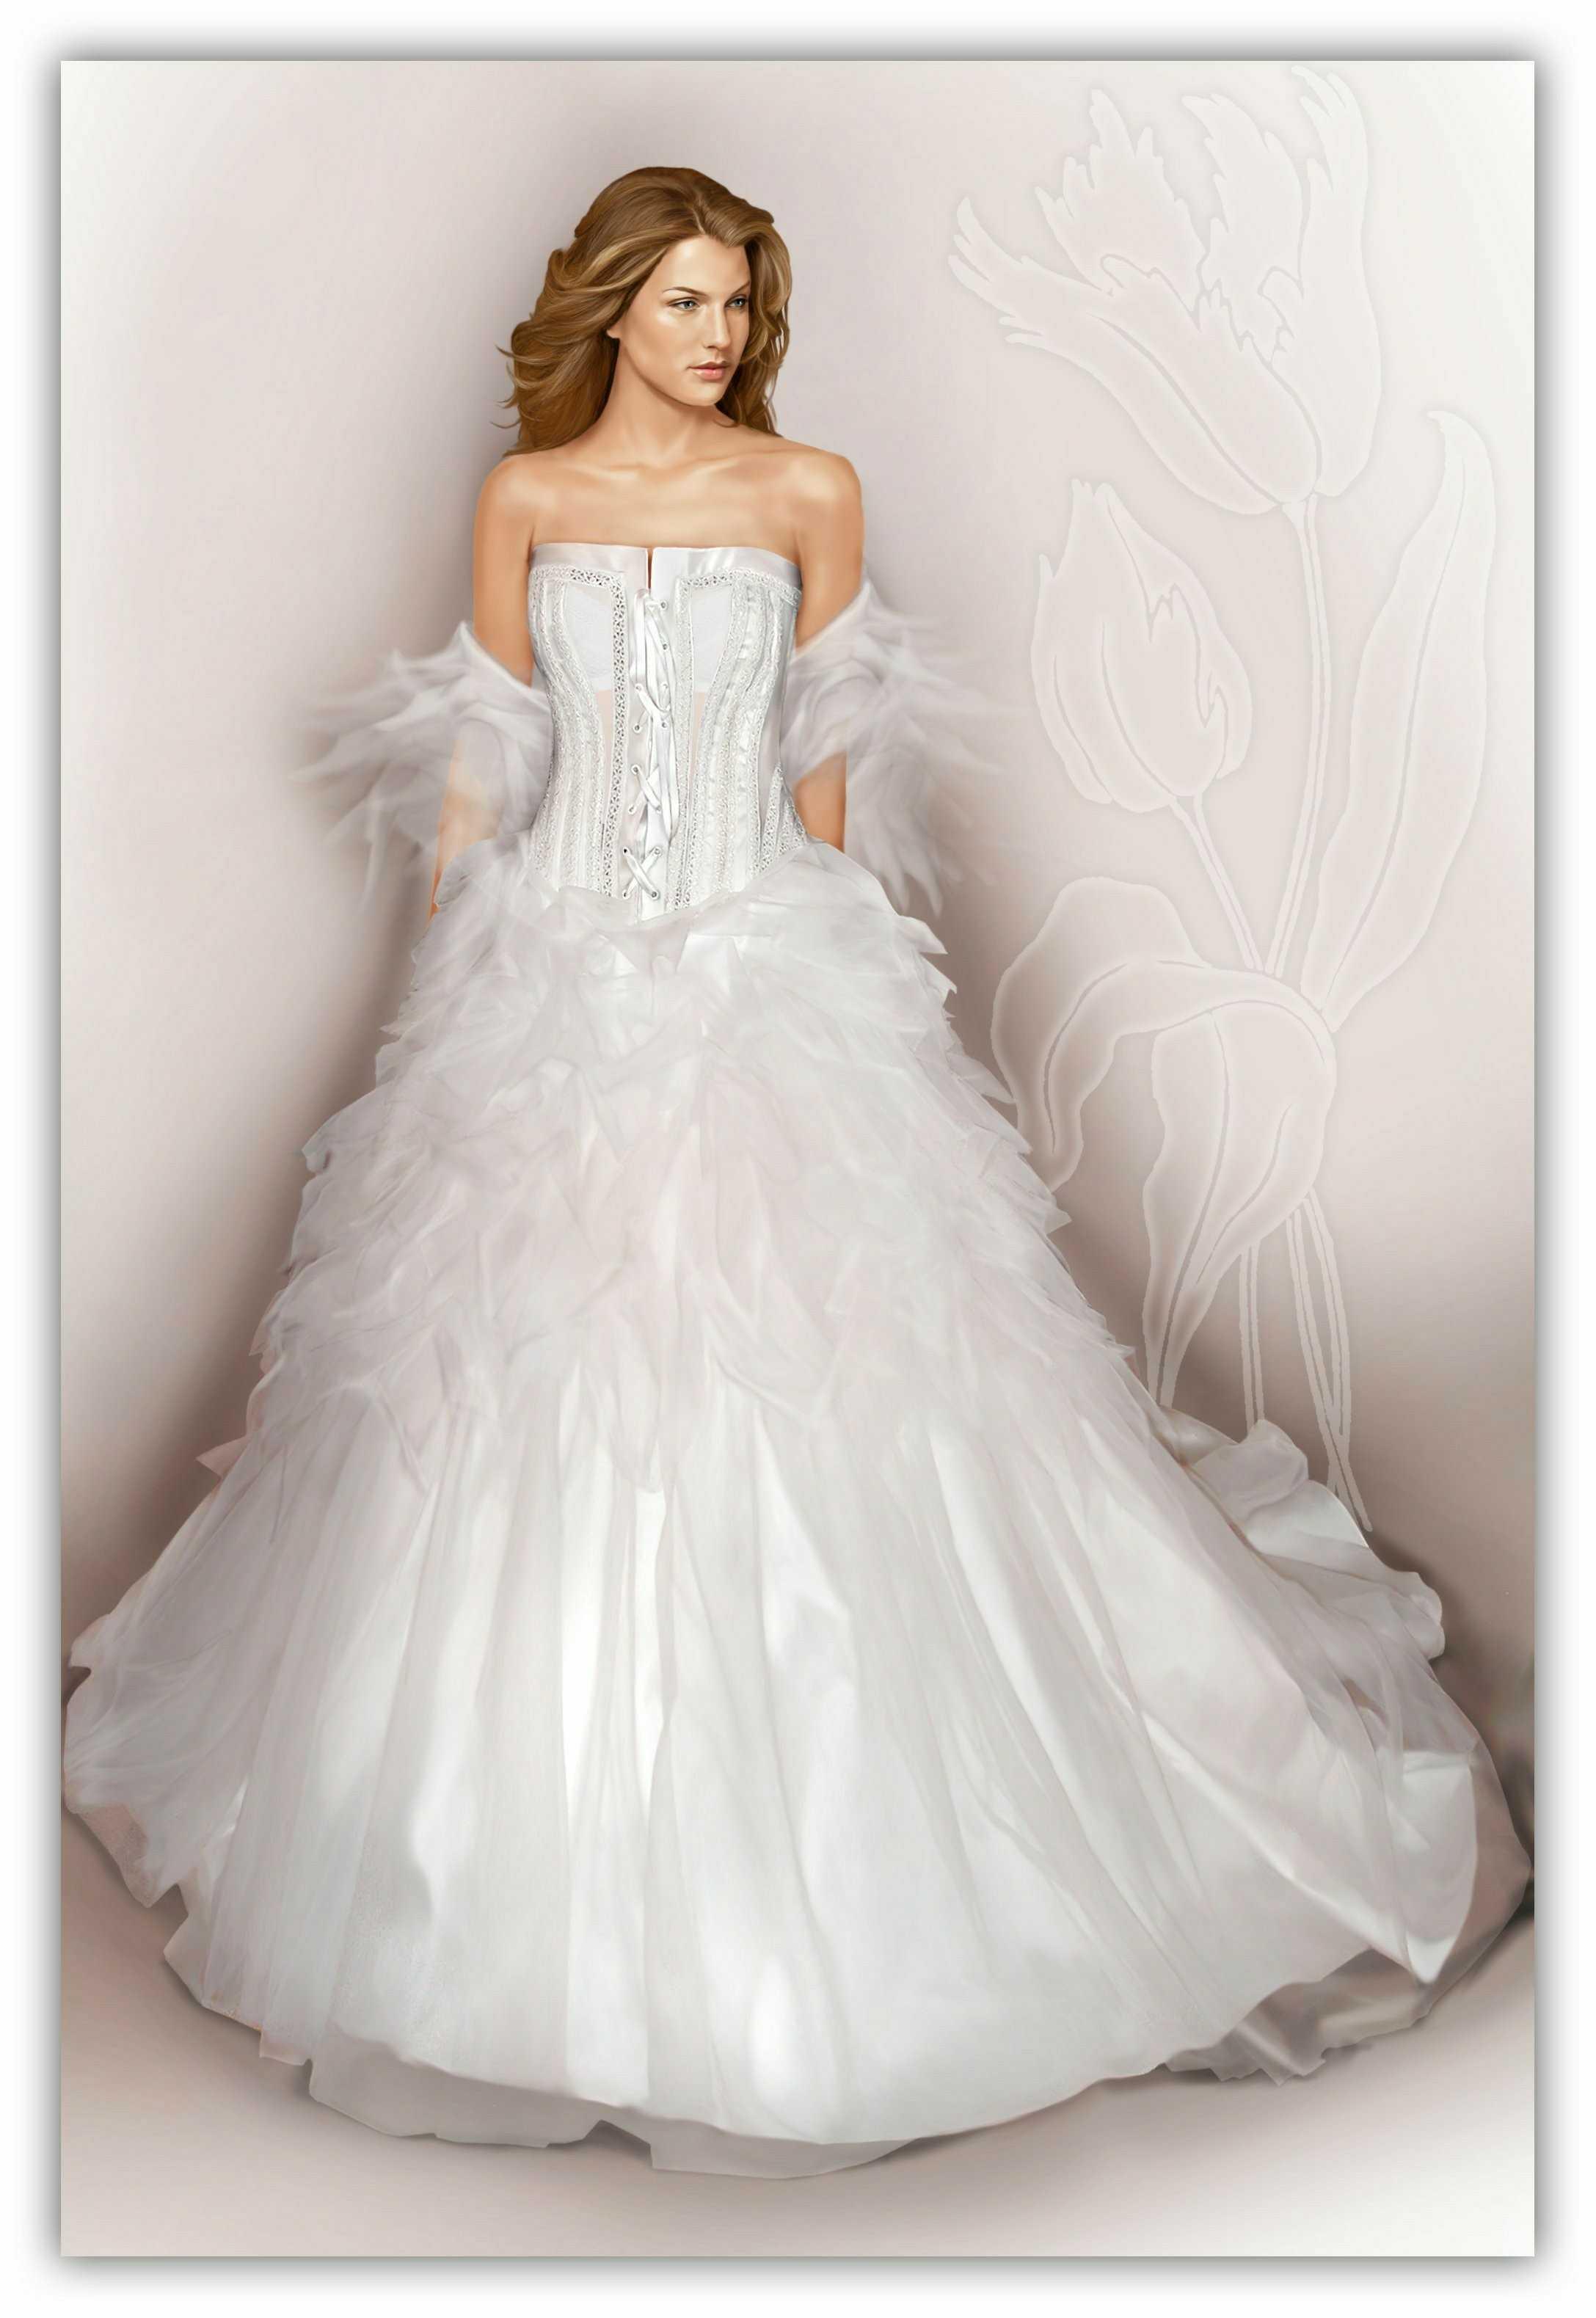 free wedding dress patterns download - Gecce.tackletarts.co